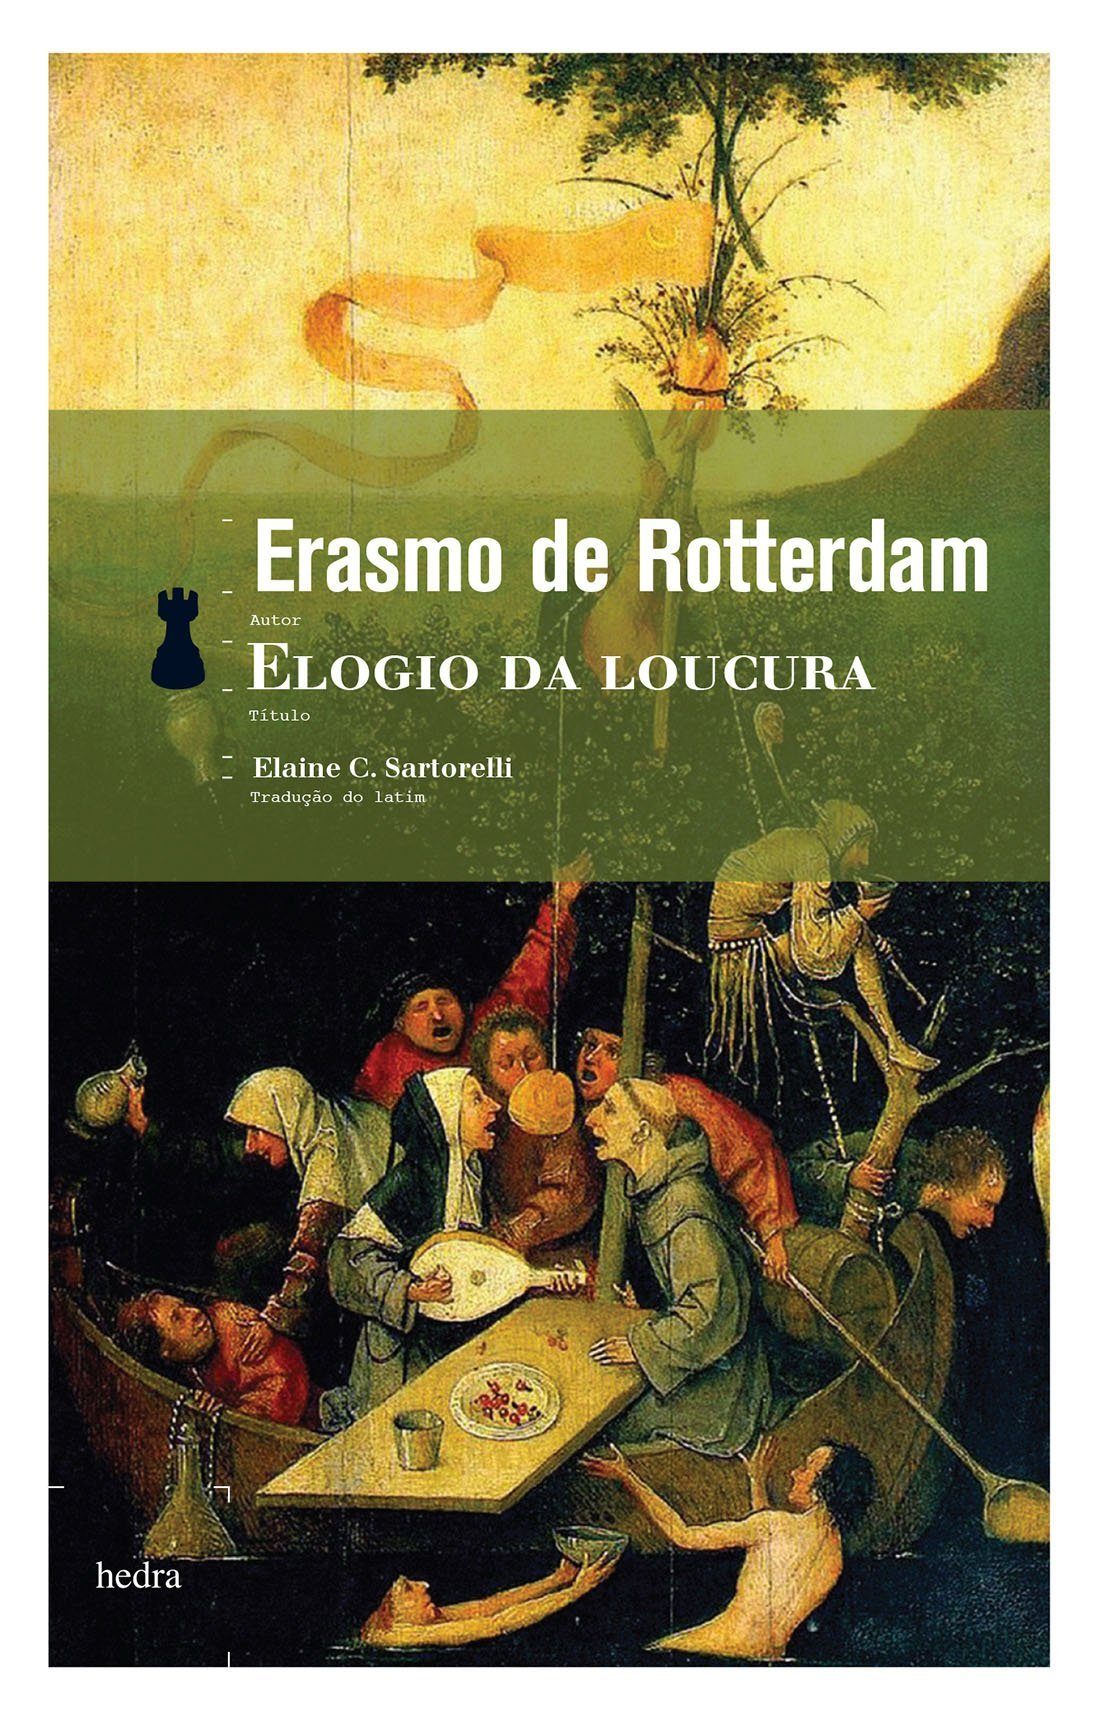 Elogia da Loucura: Amazon.es: ERASMO DE ROTTERDAM: Libros